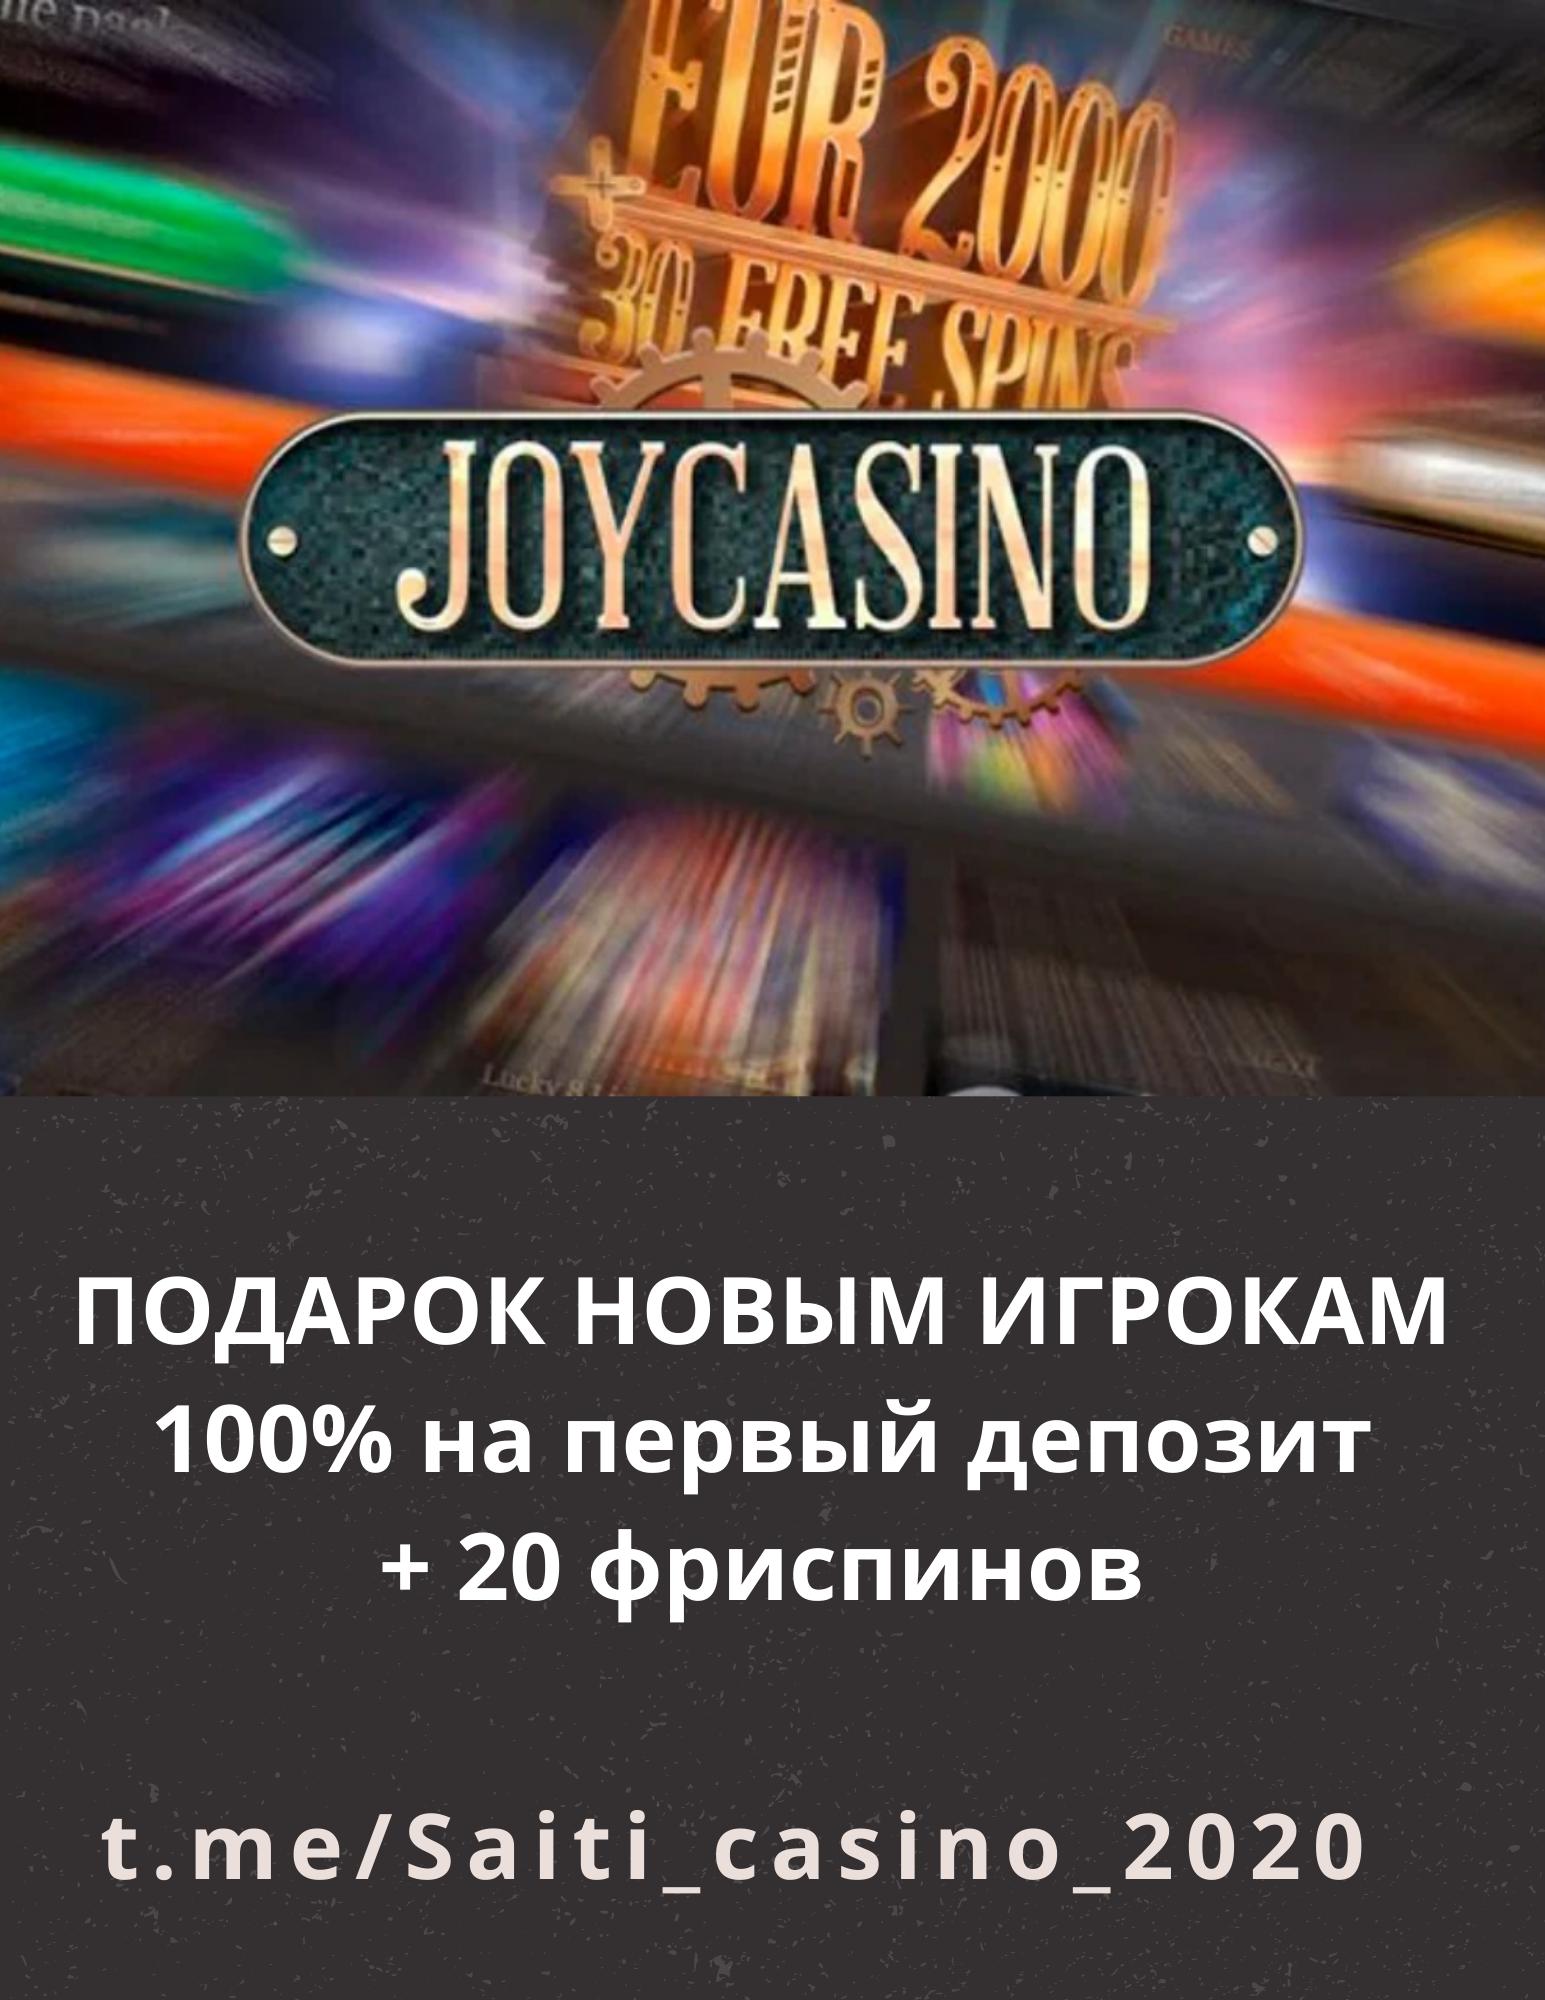 Онлайн джойказино покер турнир скачать не онлайн